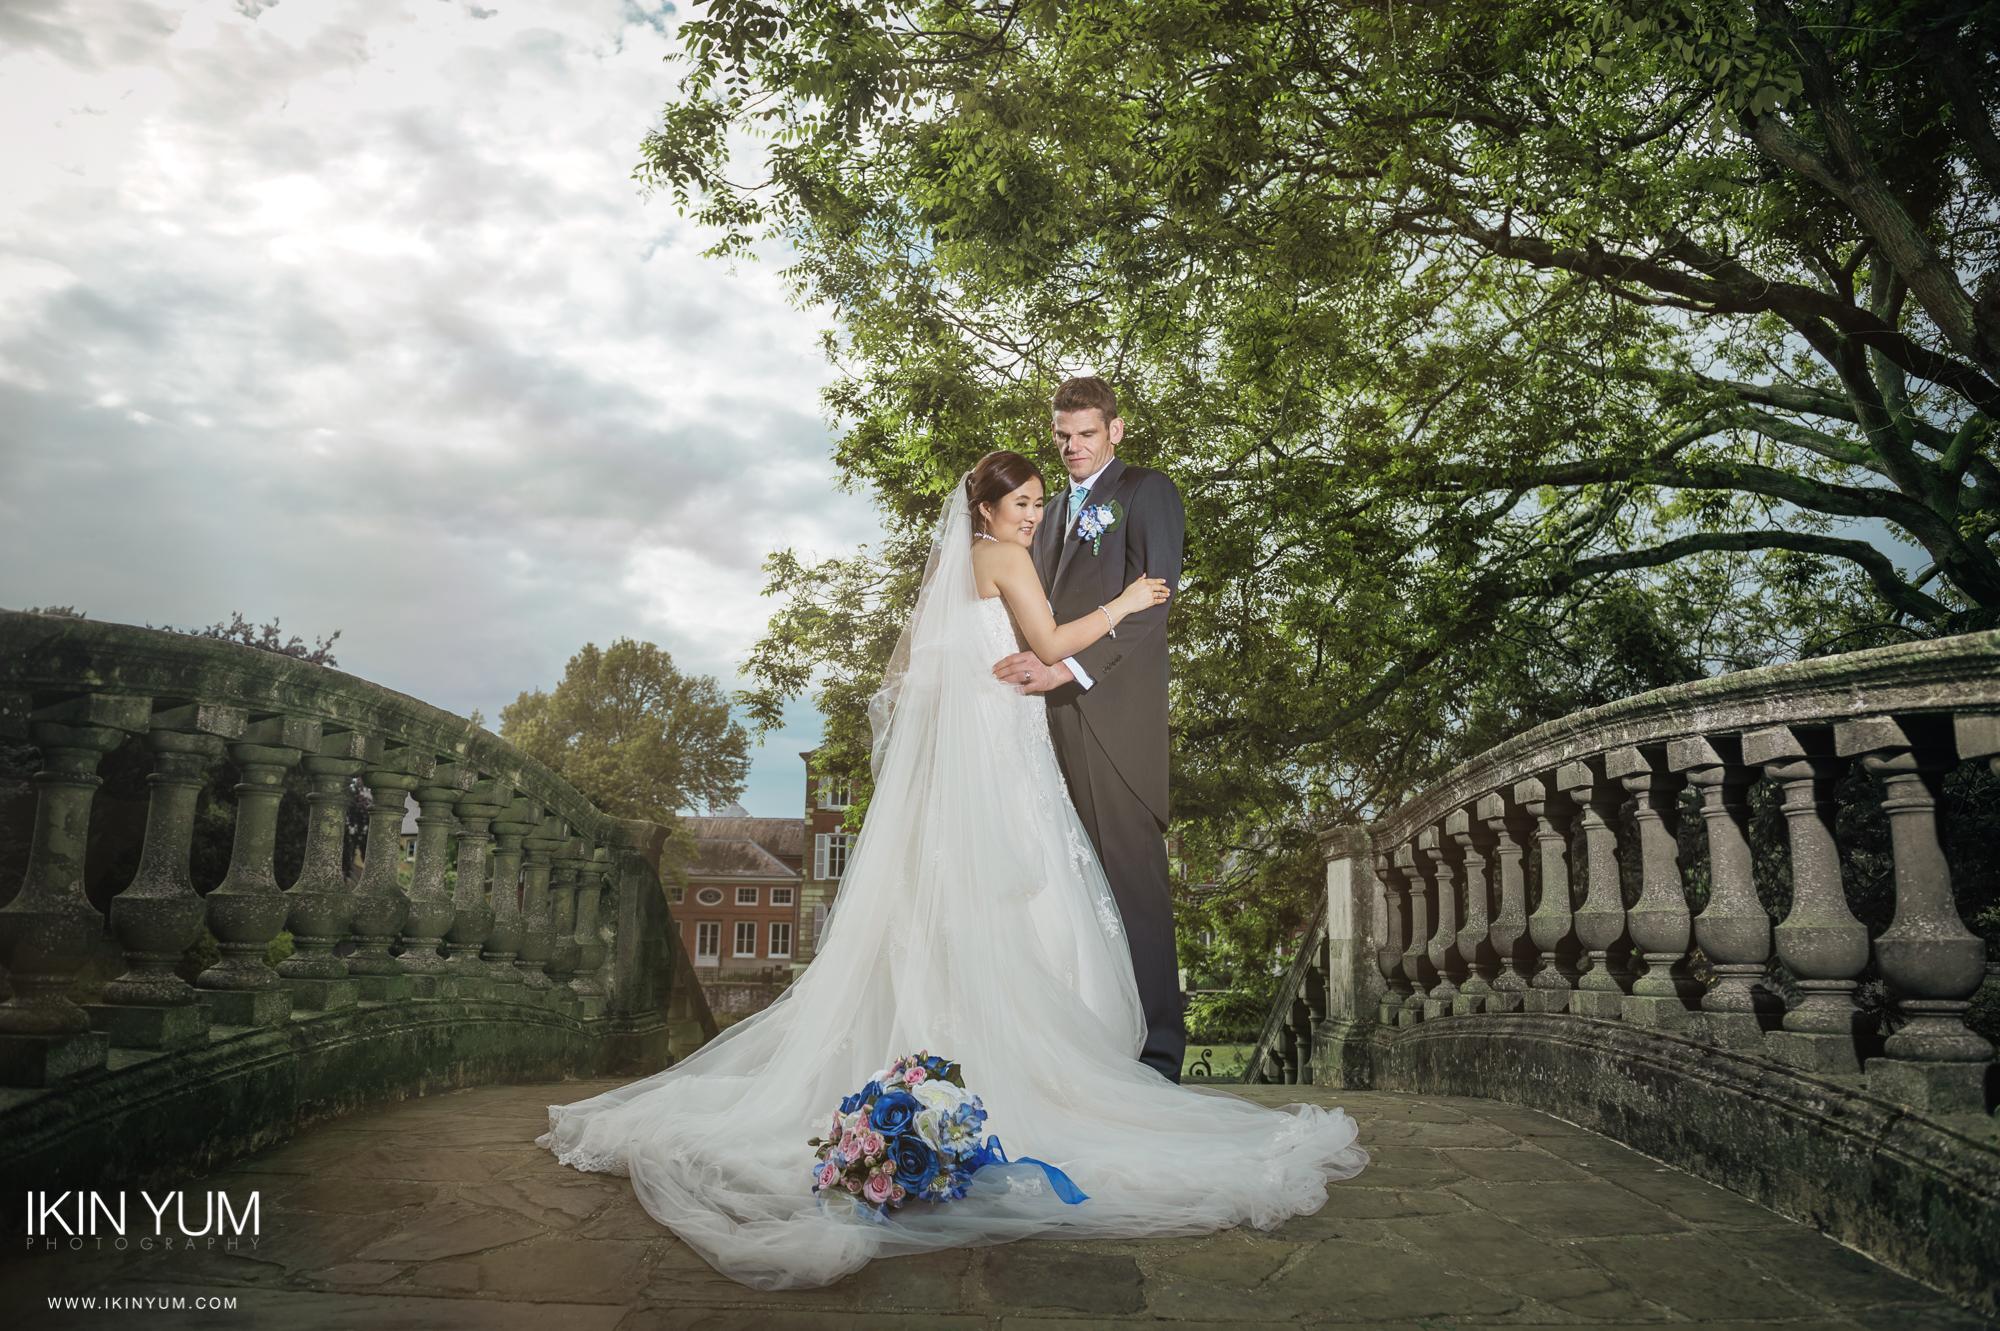 Teresa & Johnathan Weddong Day - Couple Photoshoot-0069.jpg